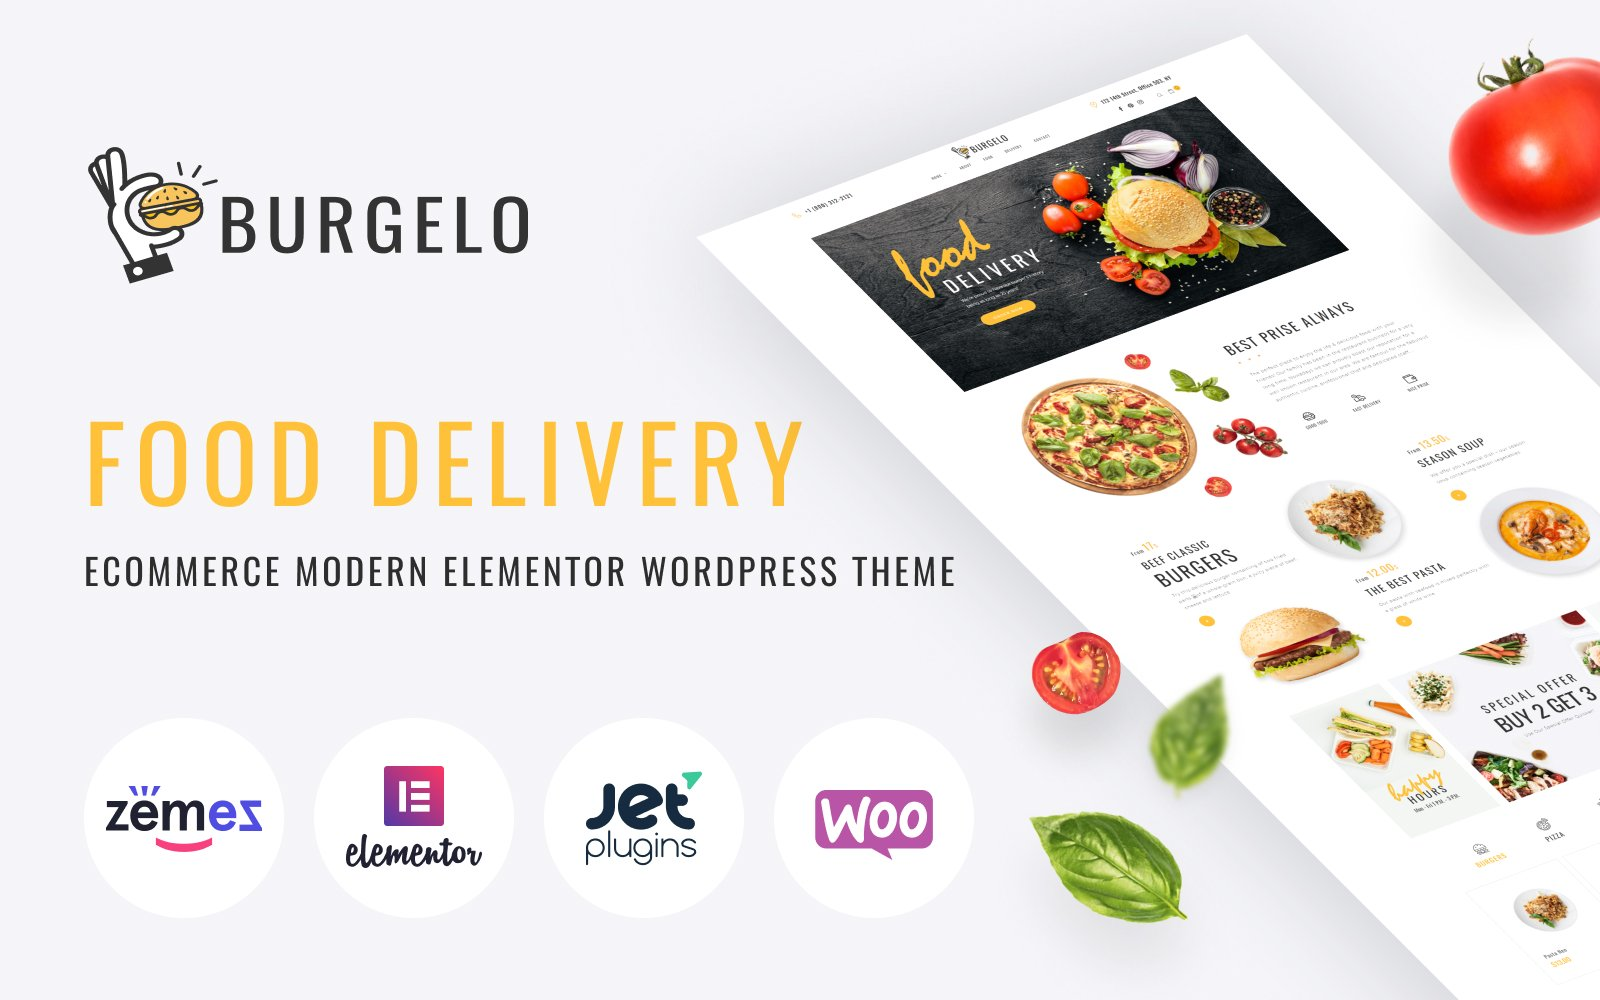 Burgelo - Food Delivery ECommerce Modern Elementor №82722